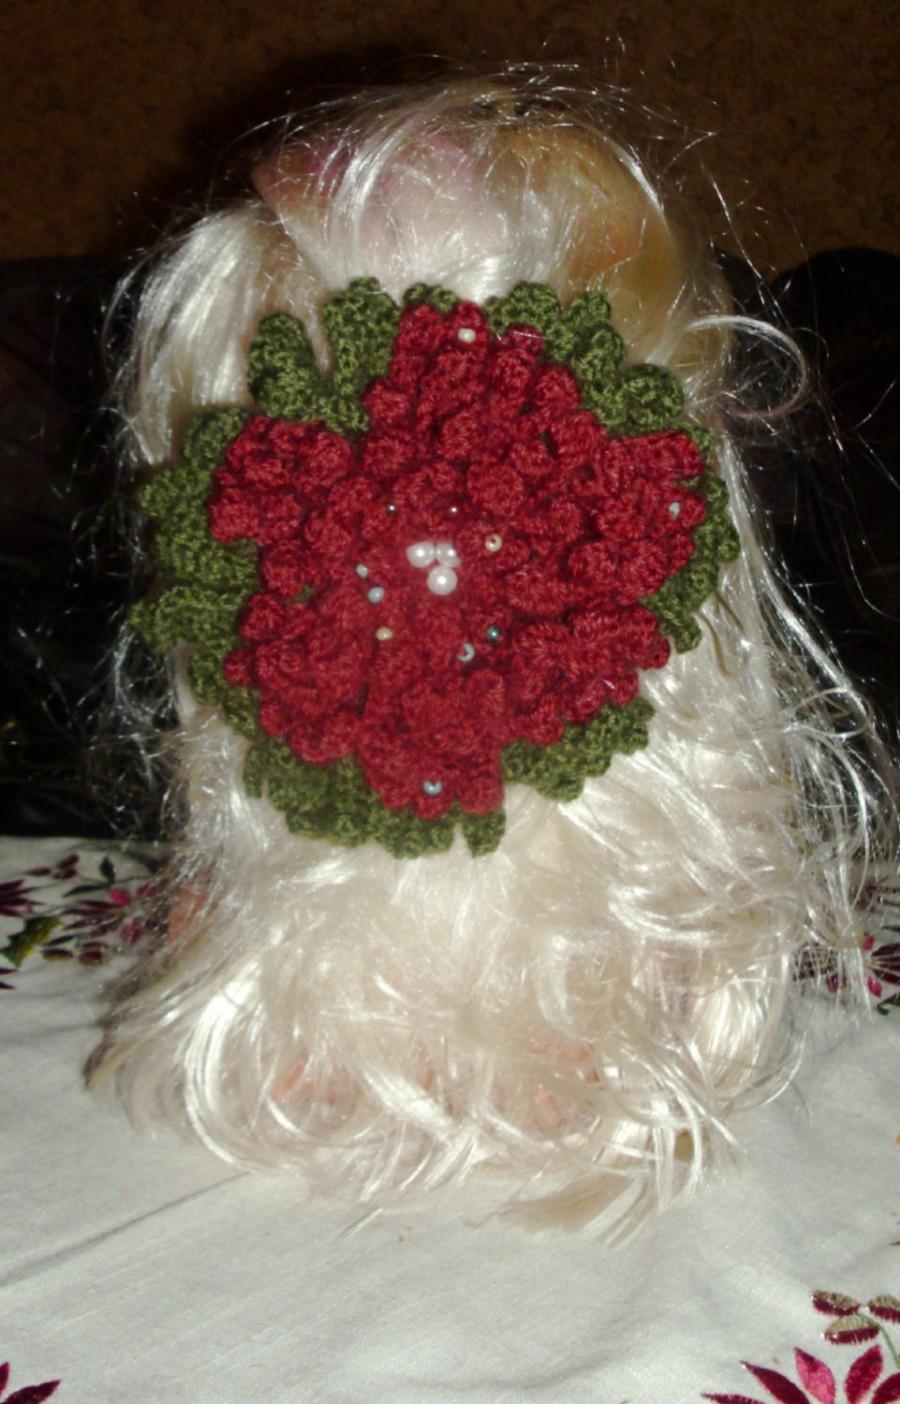 Hochzeit - Hair accessory,Hand Crocheted Big Flower Hair Clip,crochet hair accessory,big hair accessories, boho hair accessory, Shabby Chic